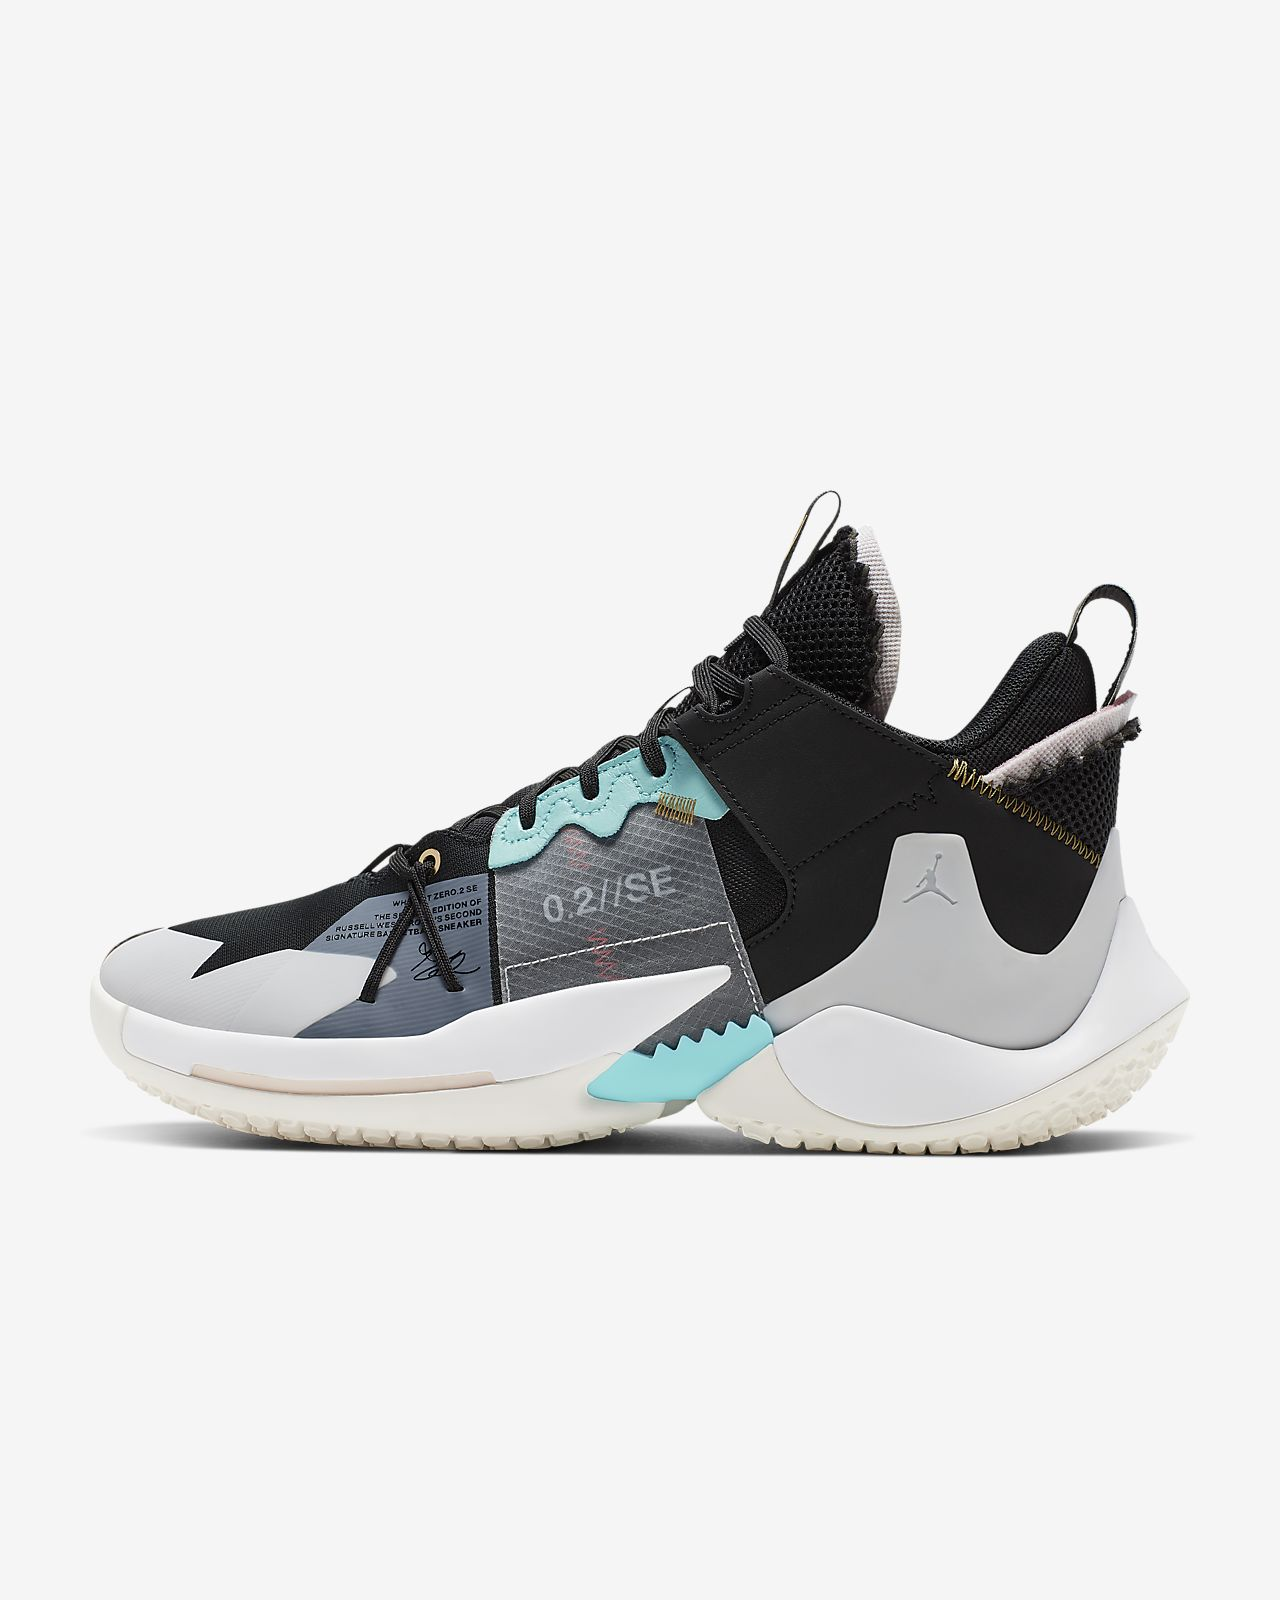 Jordan 'Why Not?' Zer0.2 SE Men's Basketball Shoe